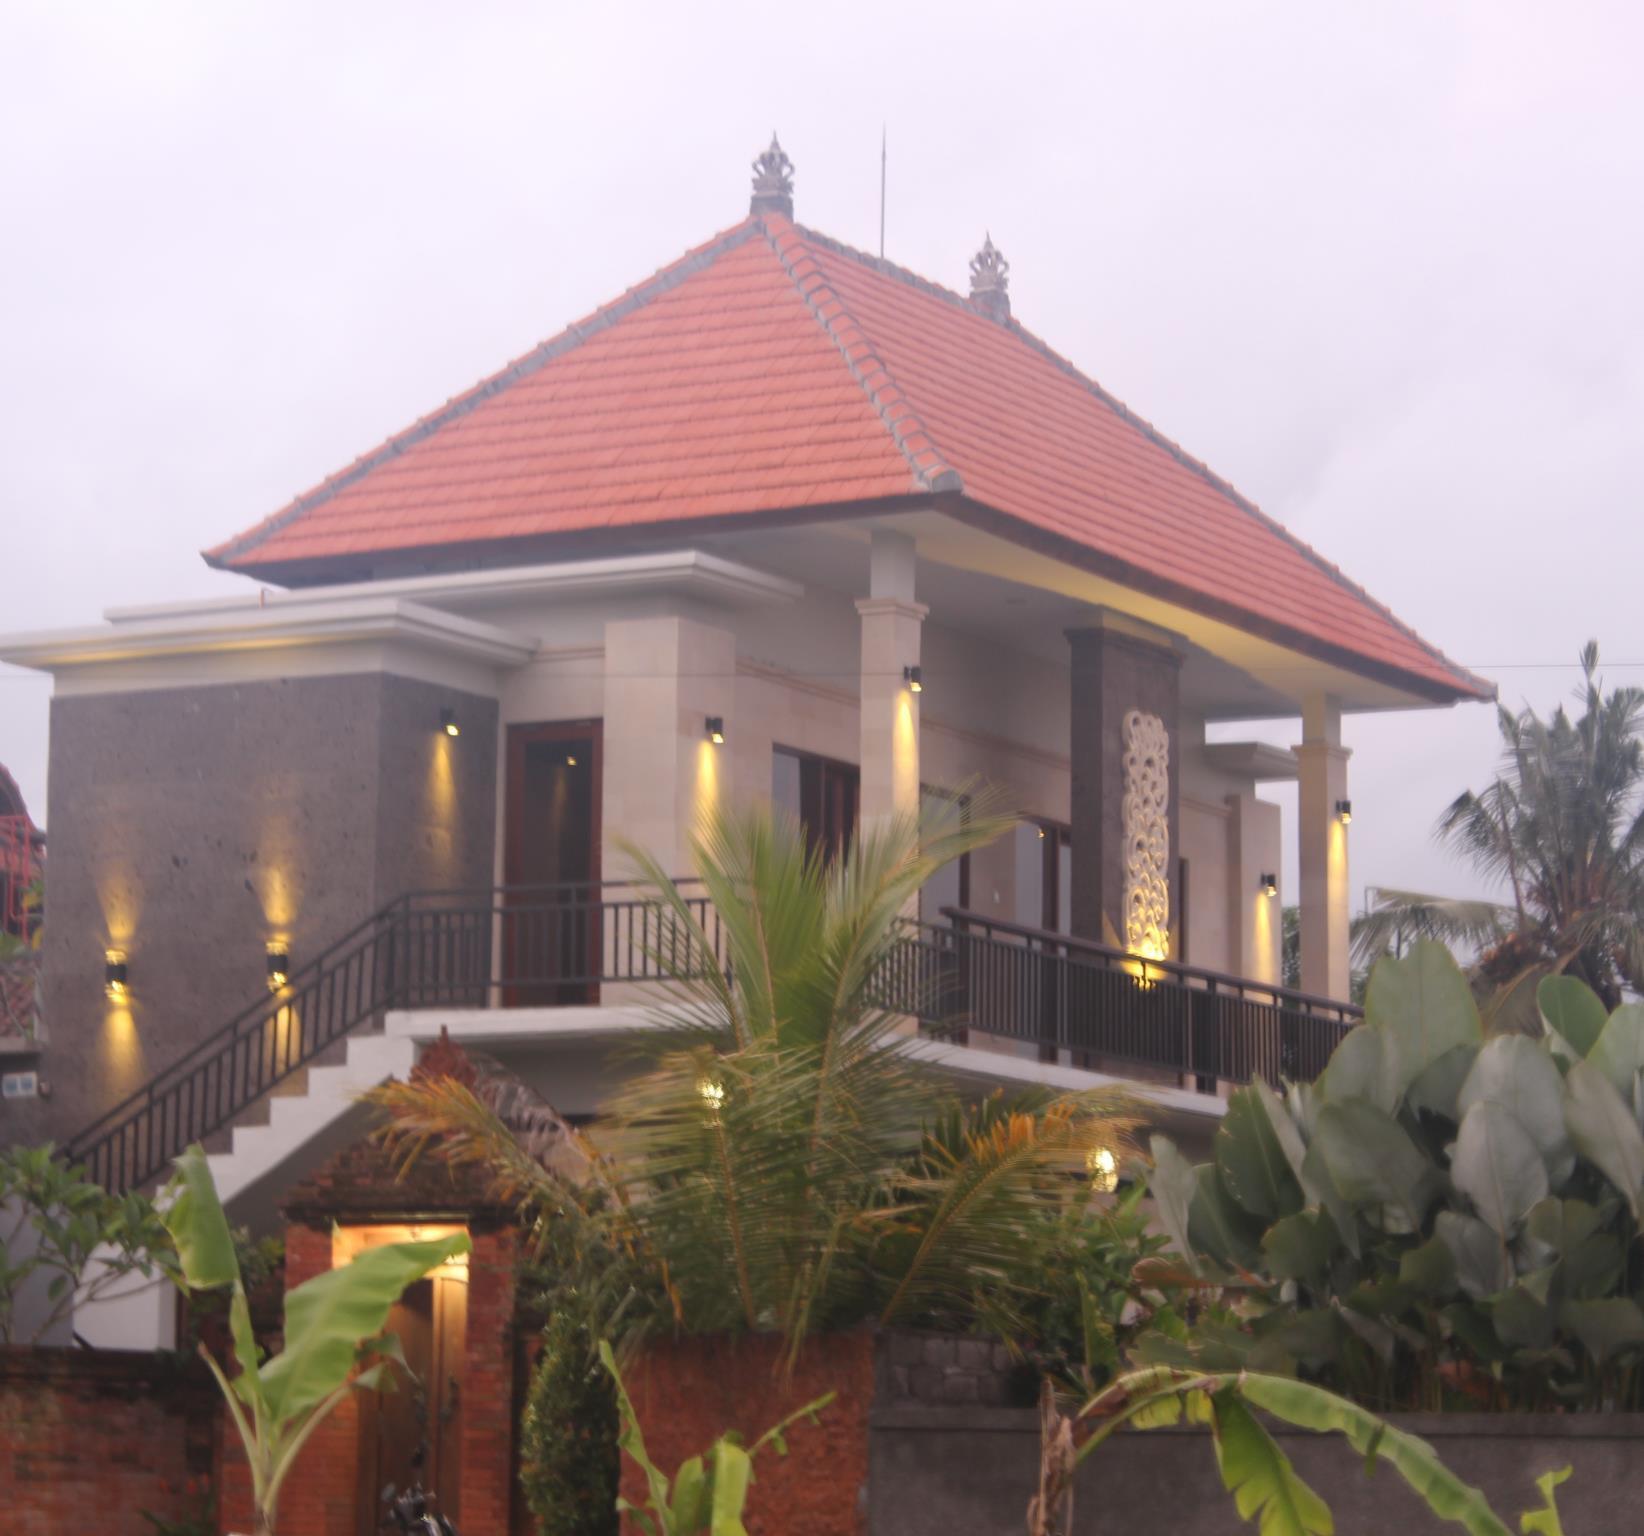 The Walet Private Villa